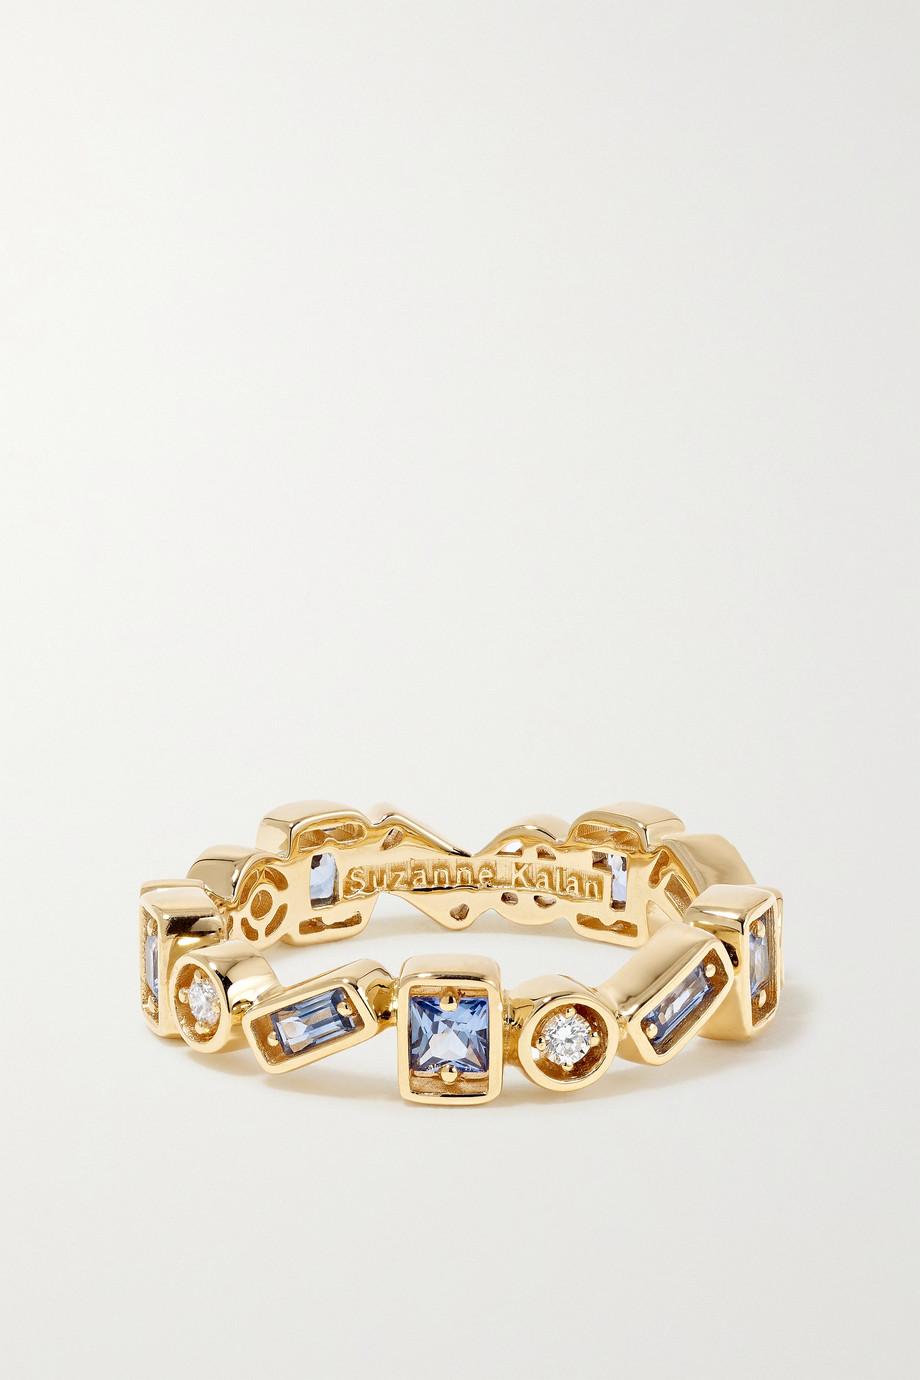 Suzanne Kalan 18-karat gold, sapphire and diamond ring